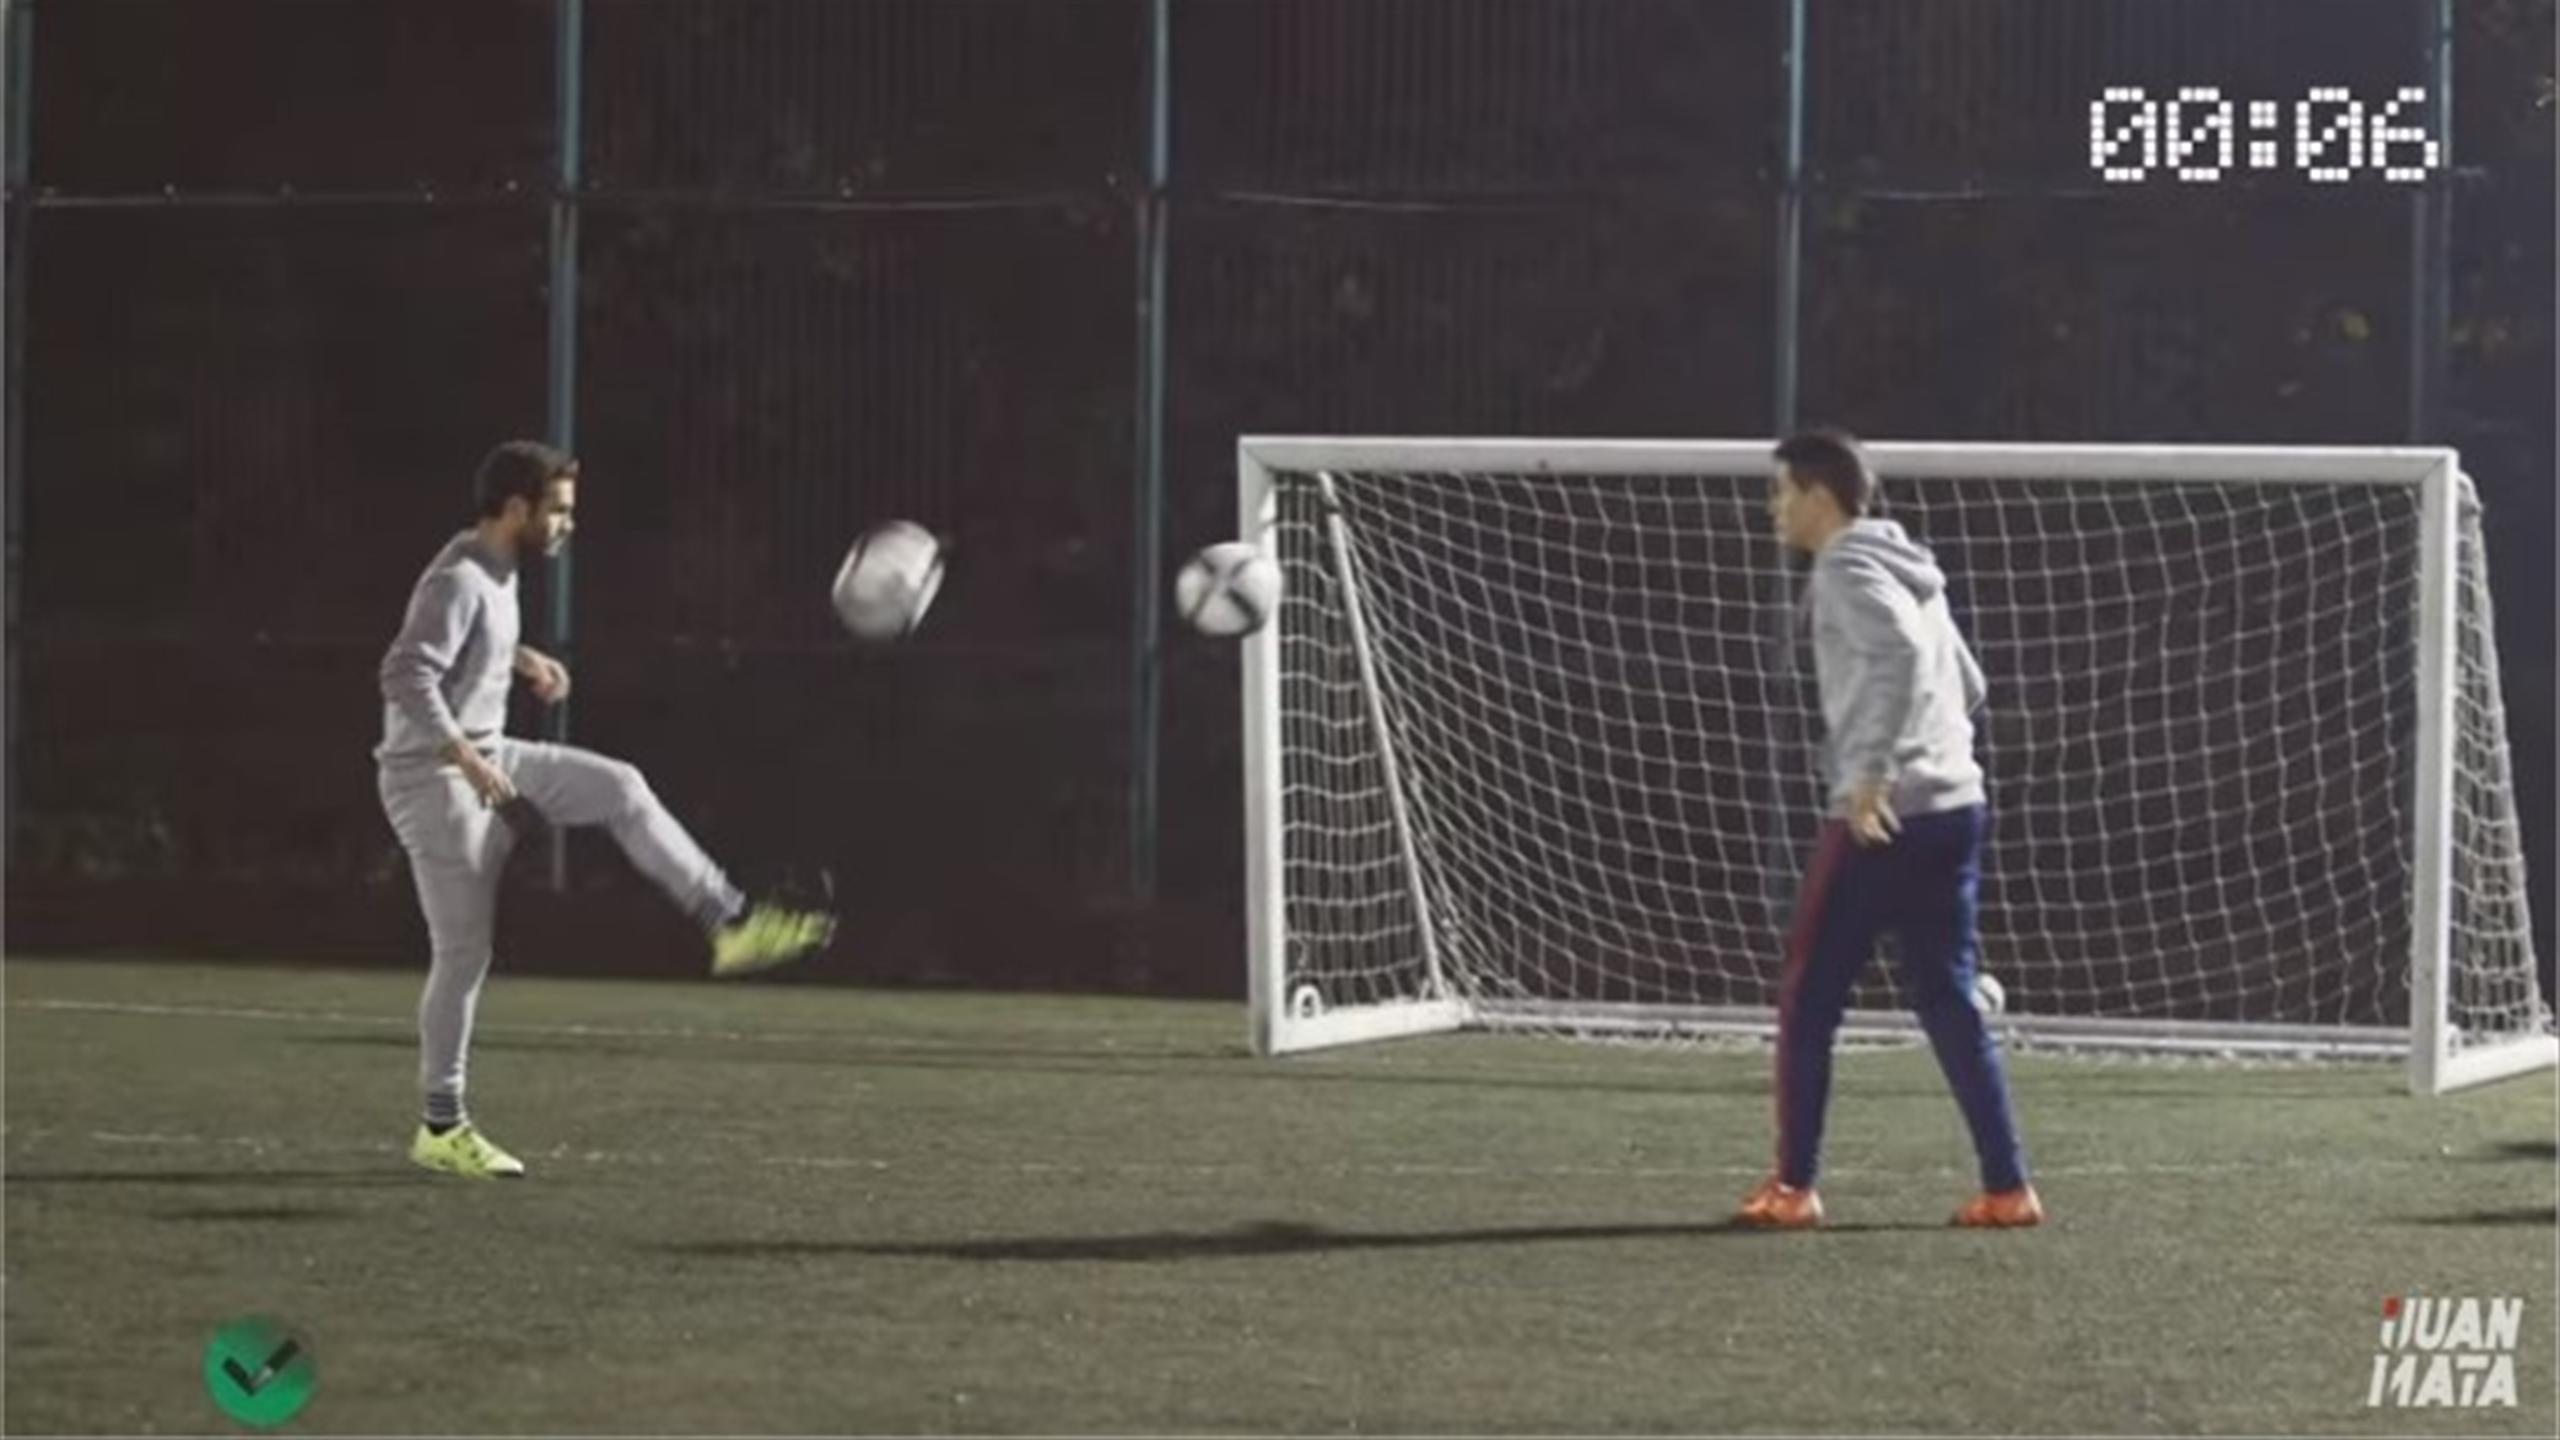 Manchester United's Juan Mata and Ander Herrera take on 'Two balls challenge' (Youtube)